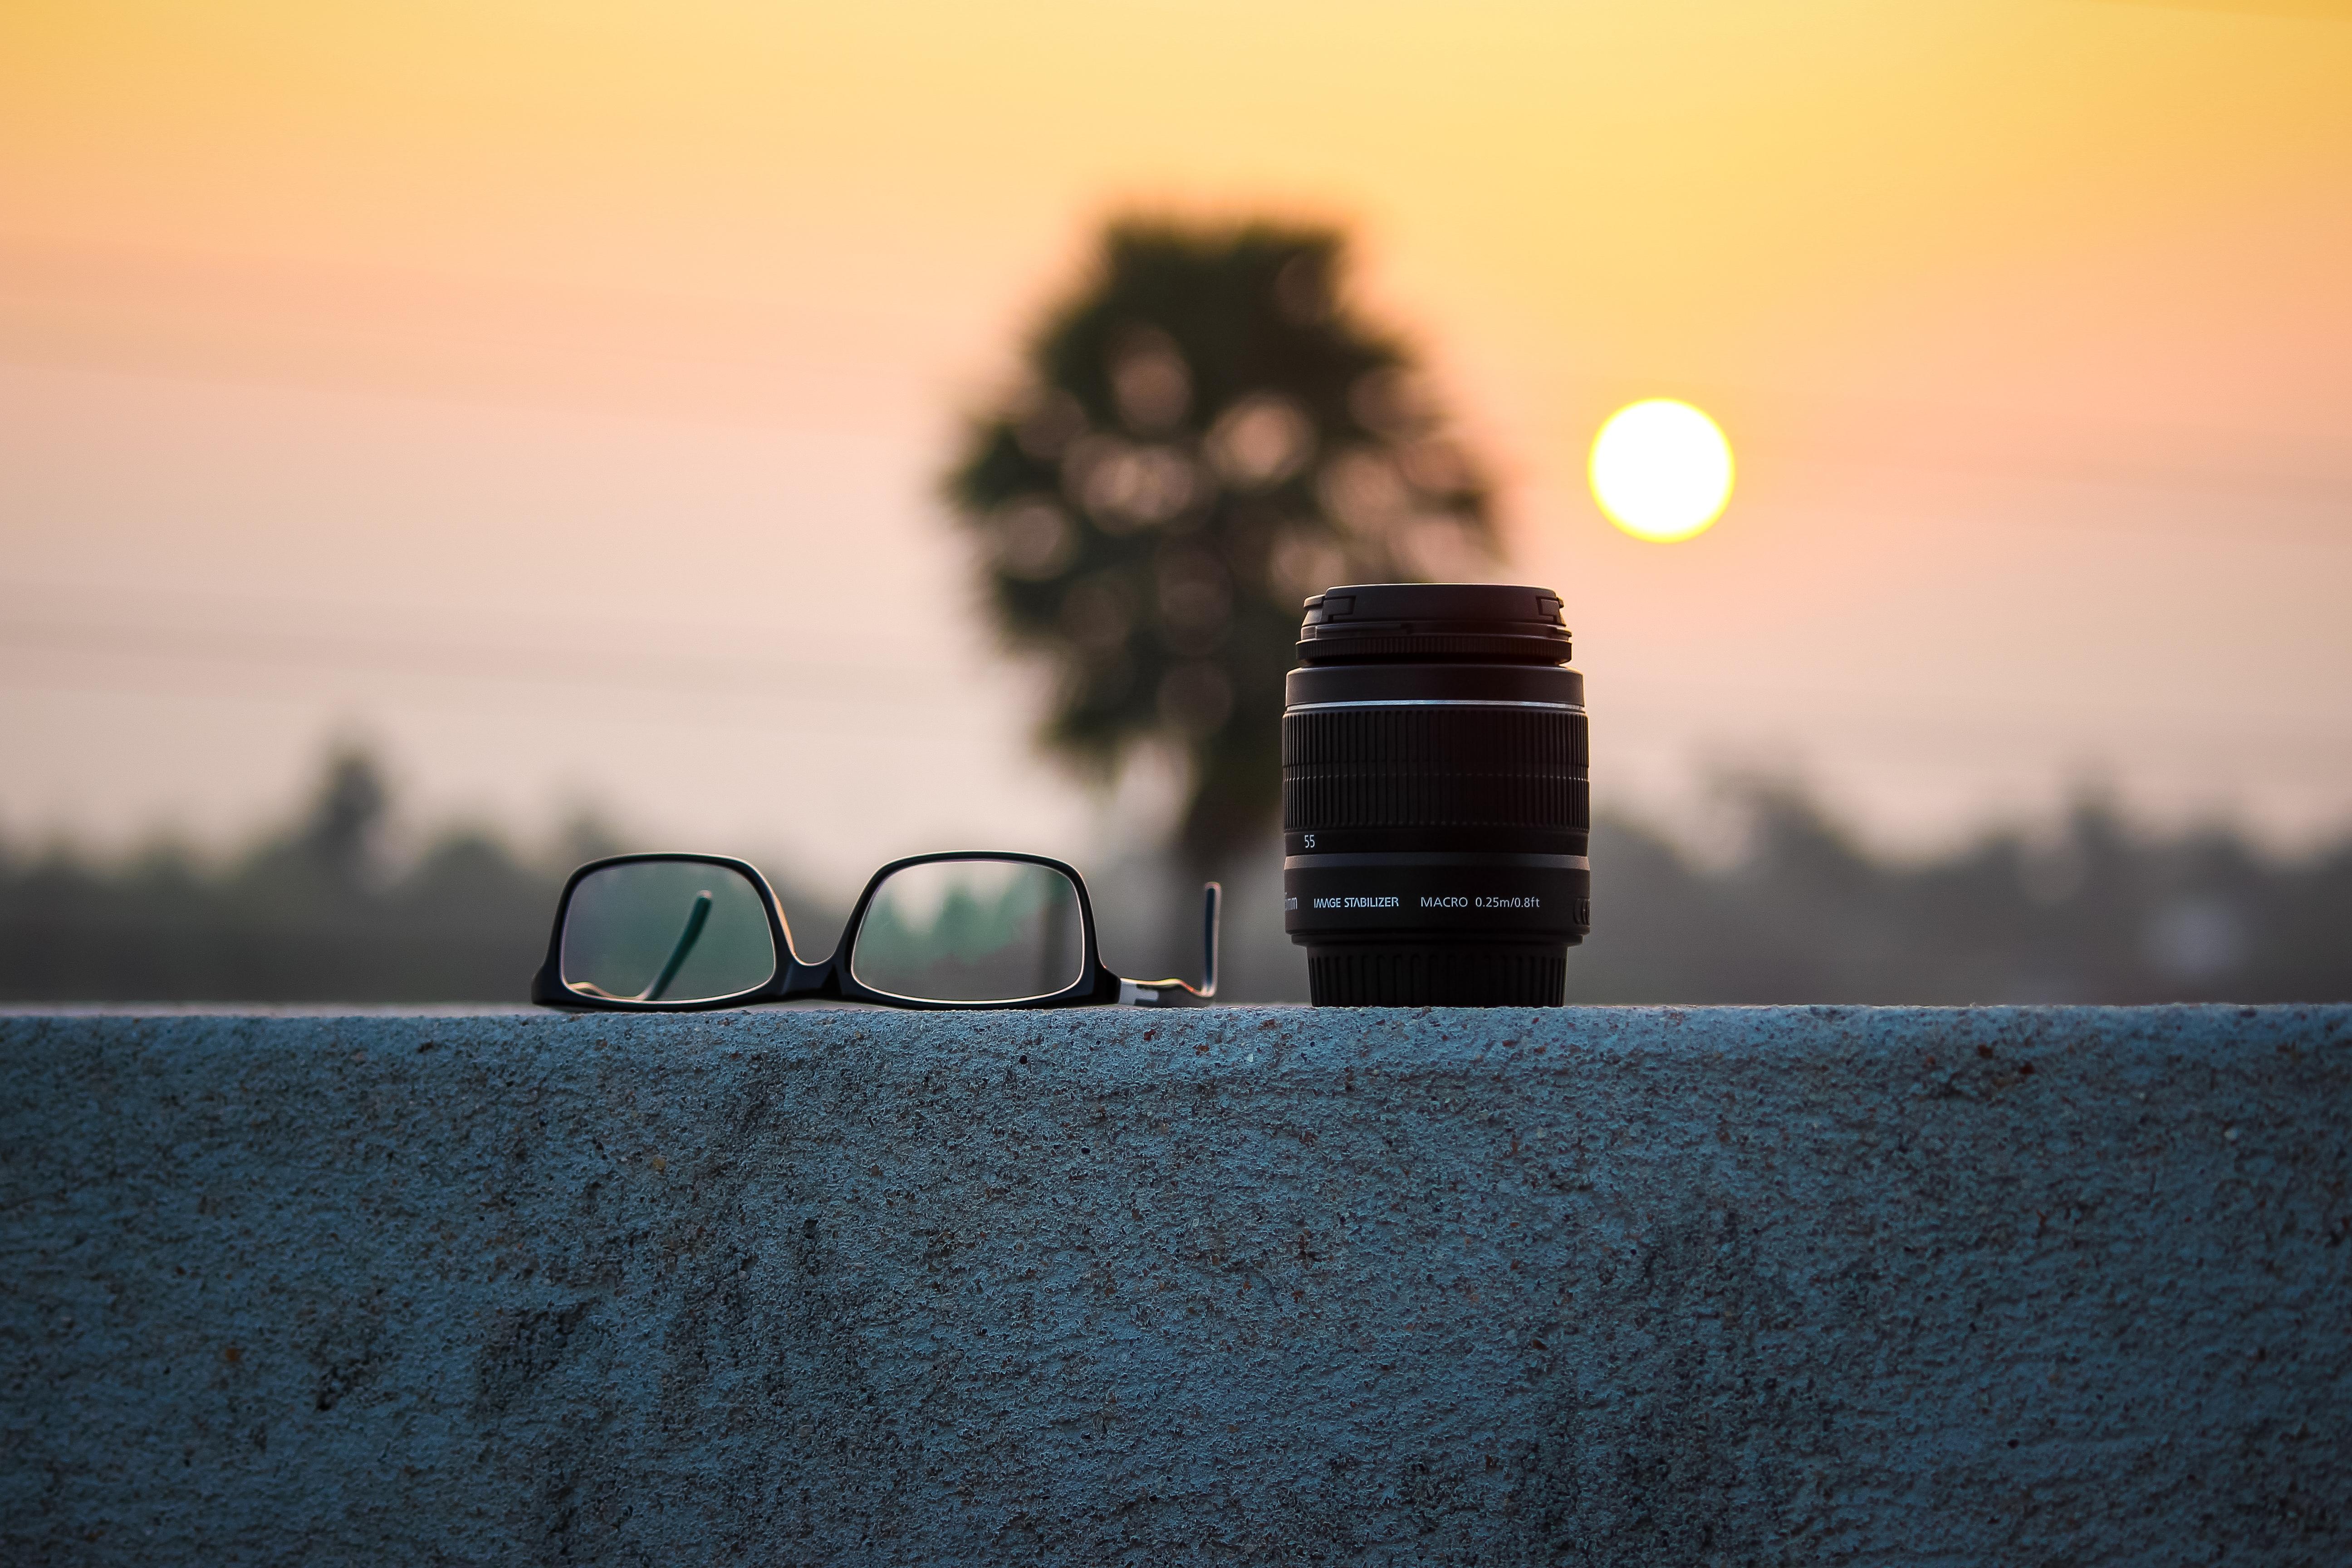 How to eyewear photograph